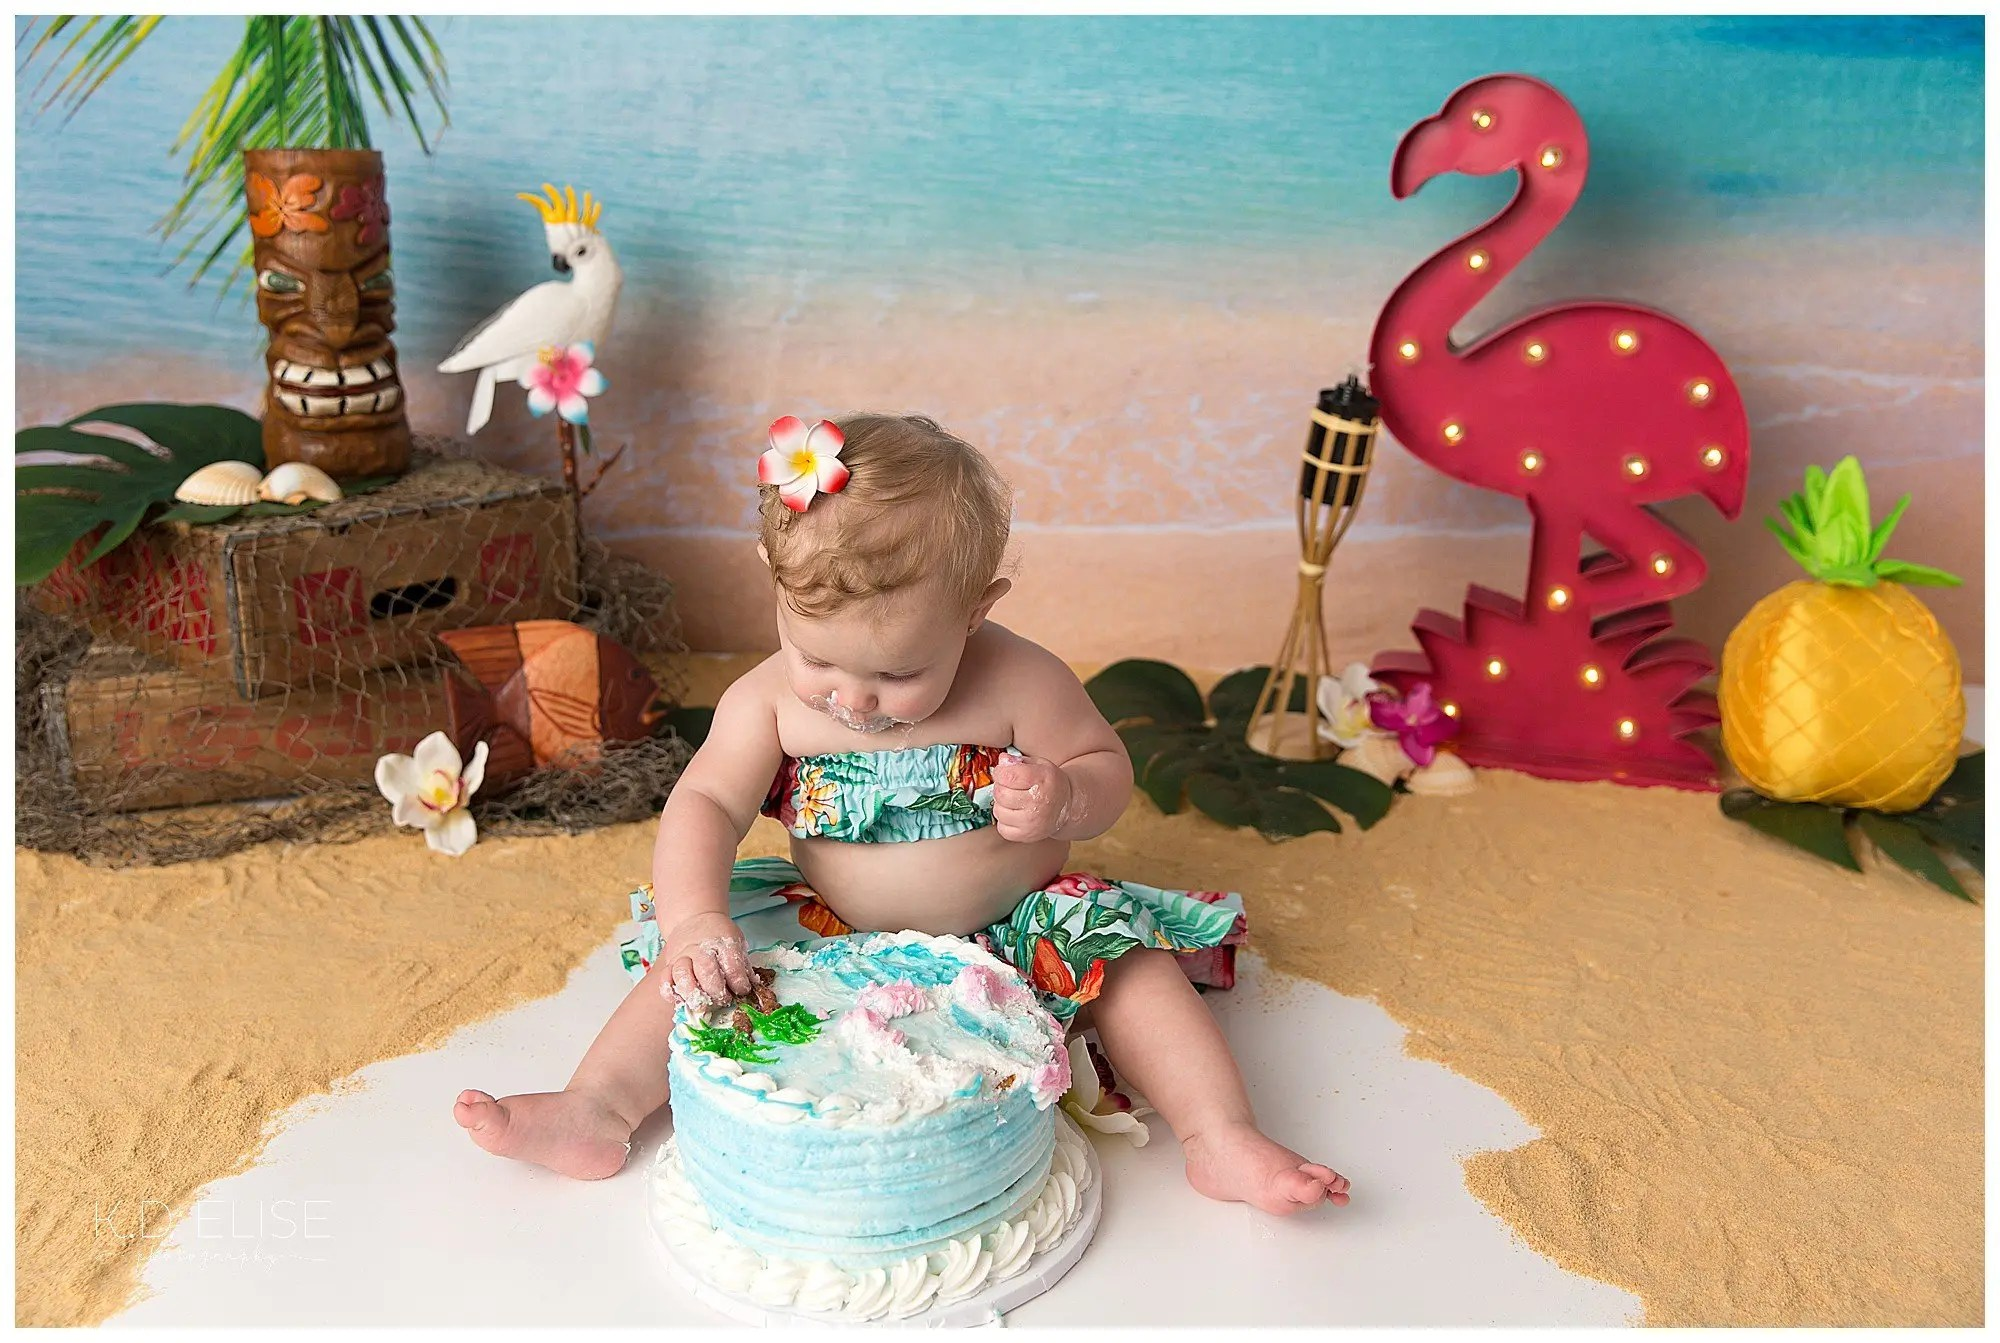 Baby girl eating cake during luau themed cake smash by Pueblo photographer K.D. Elise Photography.